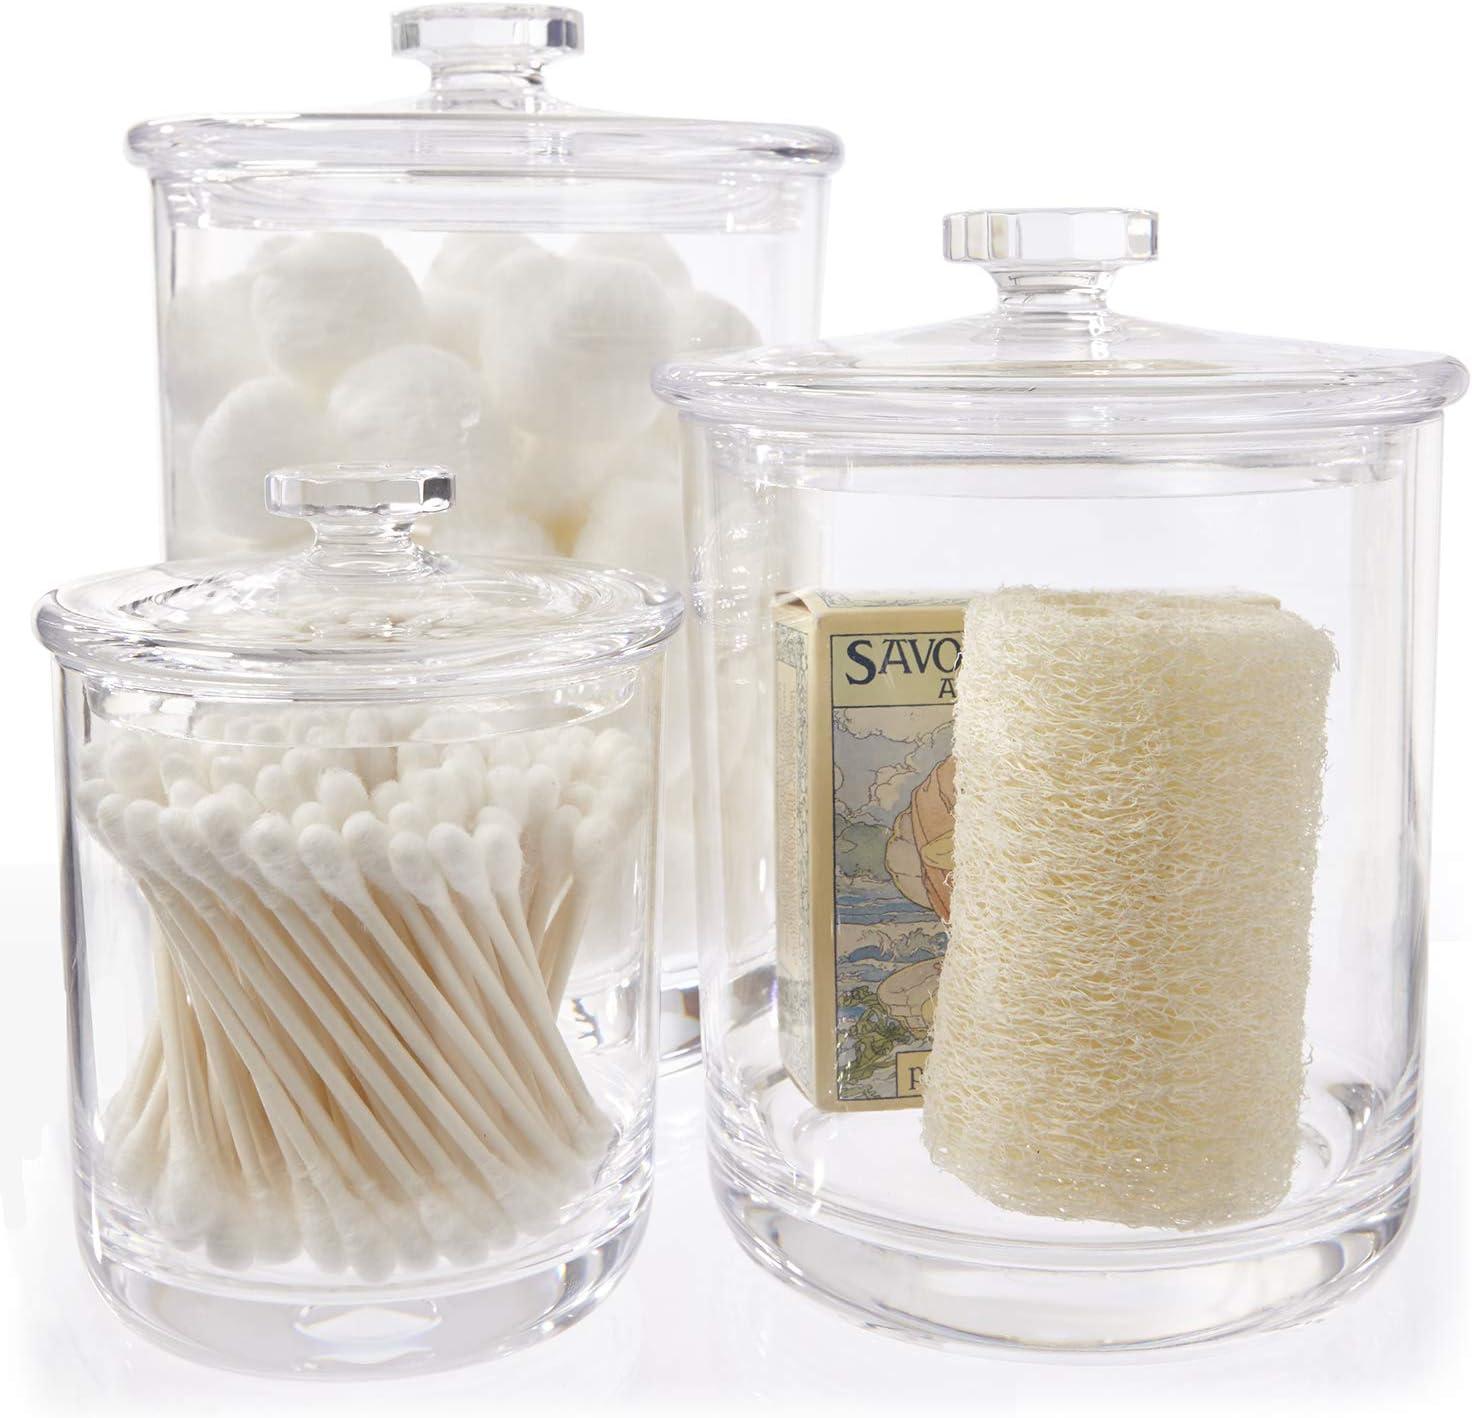 Set of 3 Multi-purpose Acrylic Holder Premium Quality Apothecary Jars Organizers